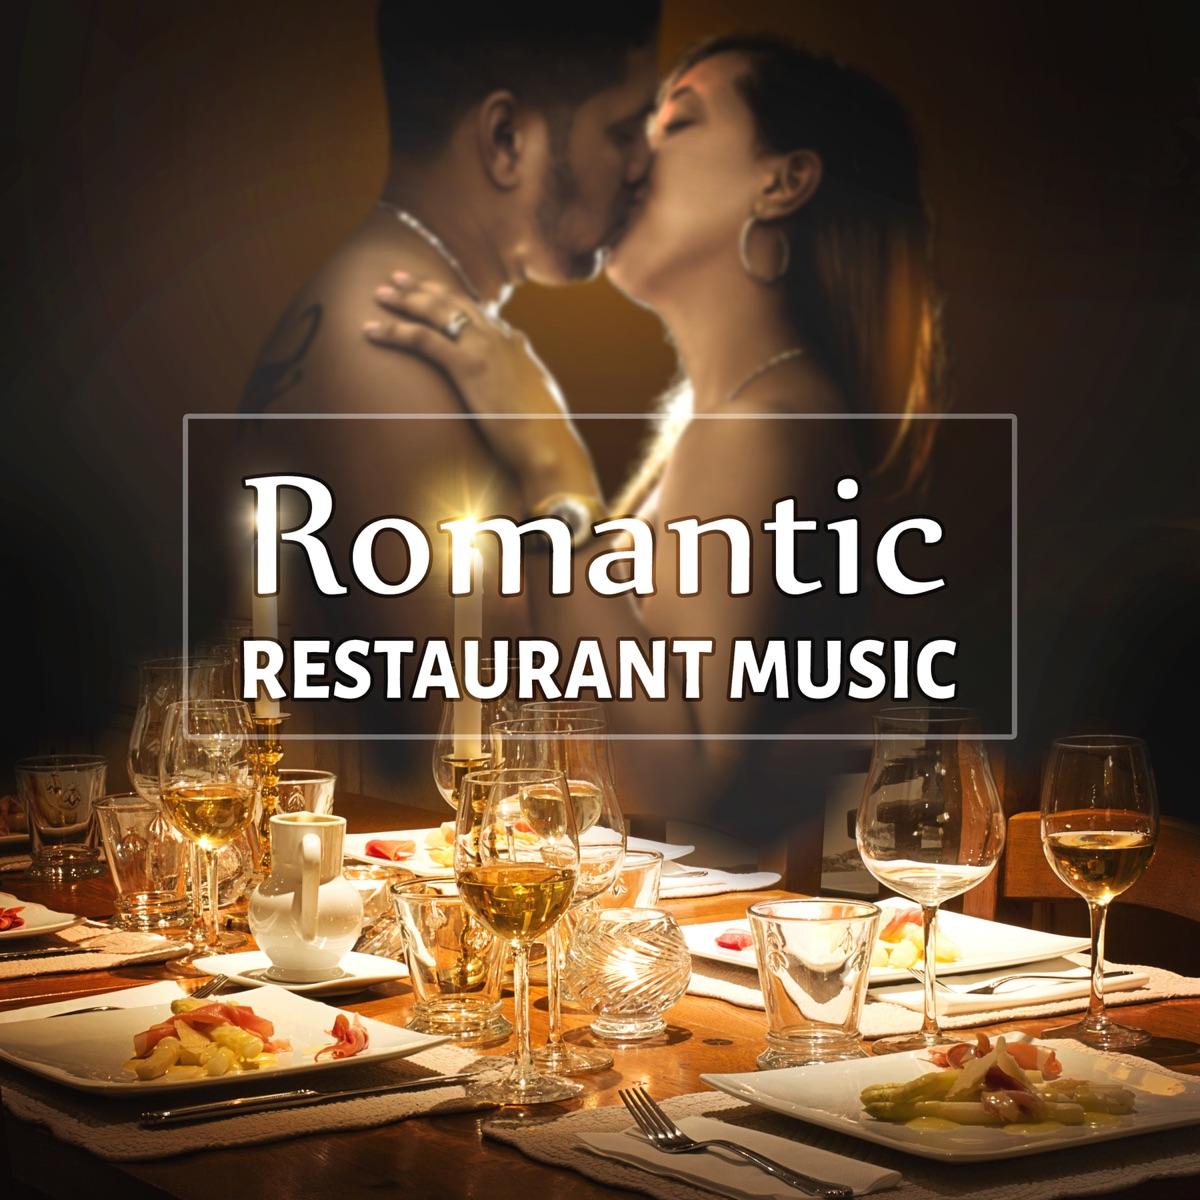 Romantic Restaurant Music: Mellow Piano Jazz Background